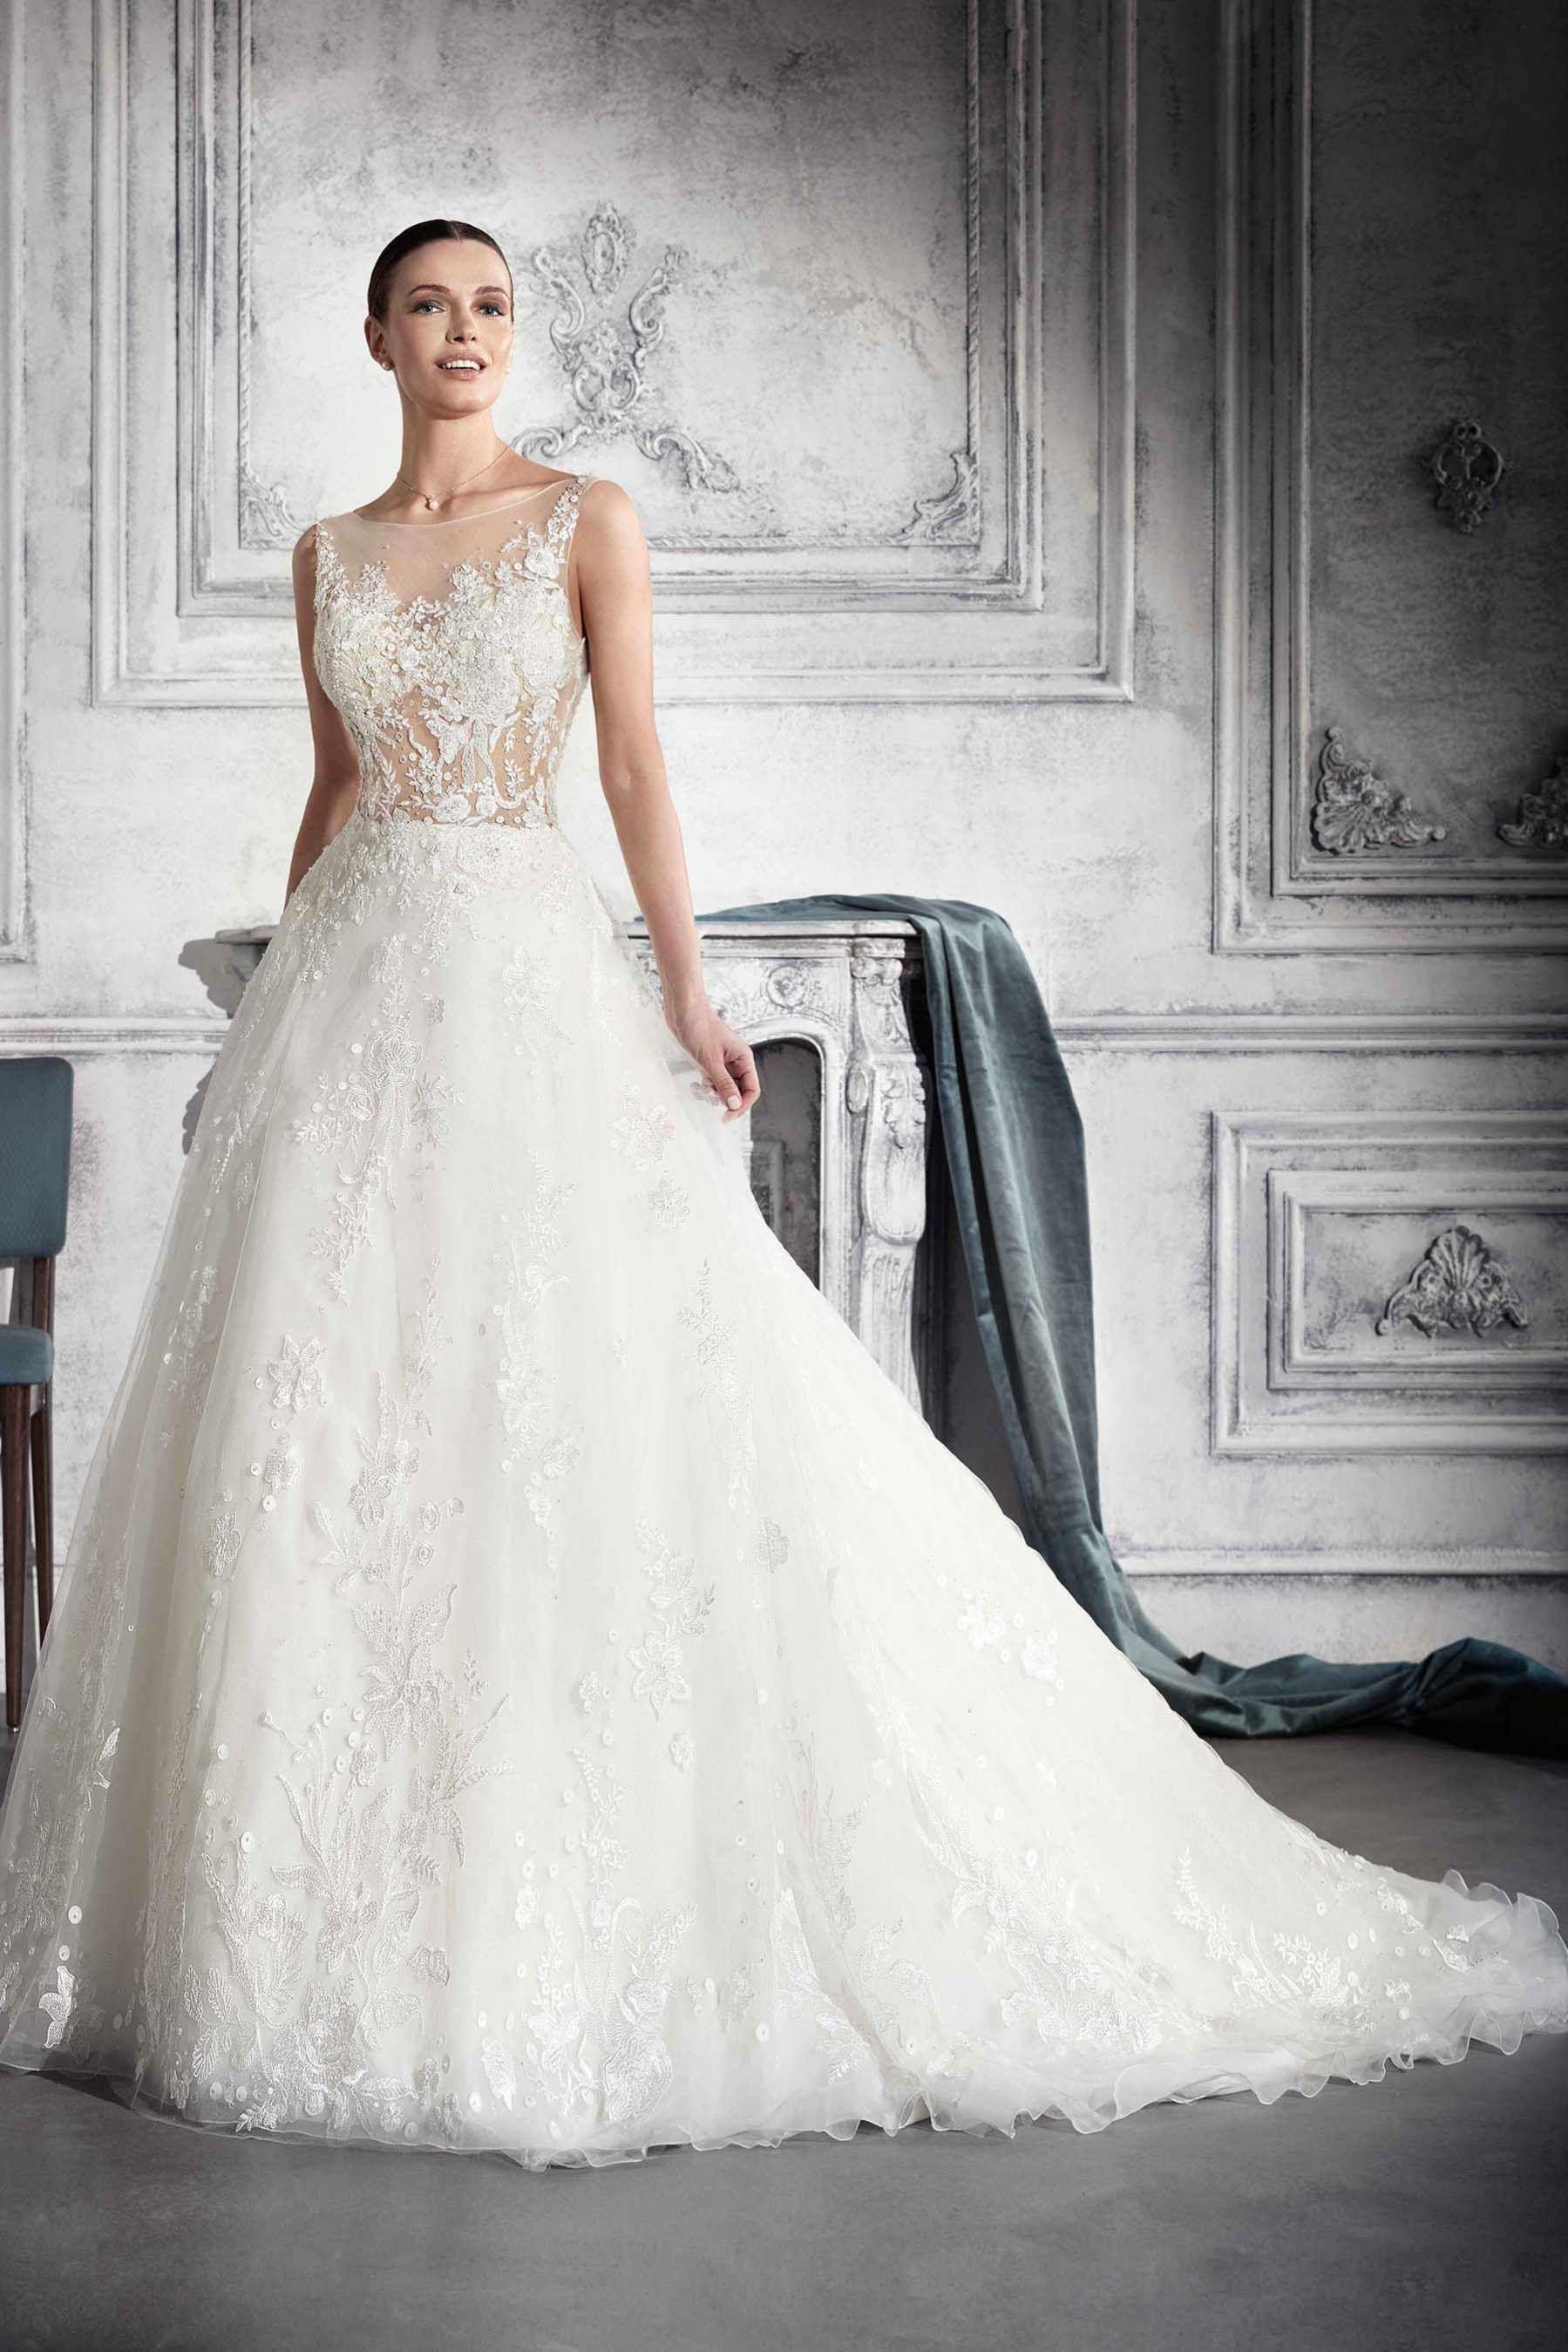 Demetrios wedding dress style wedding dress pinterest